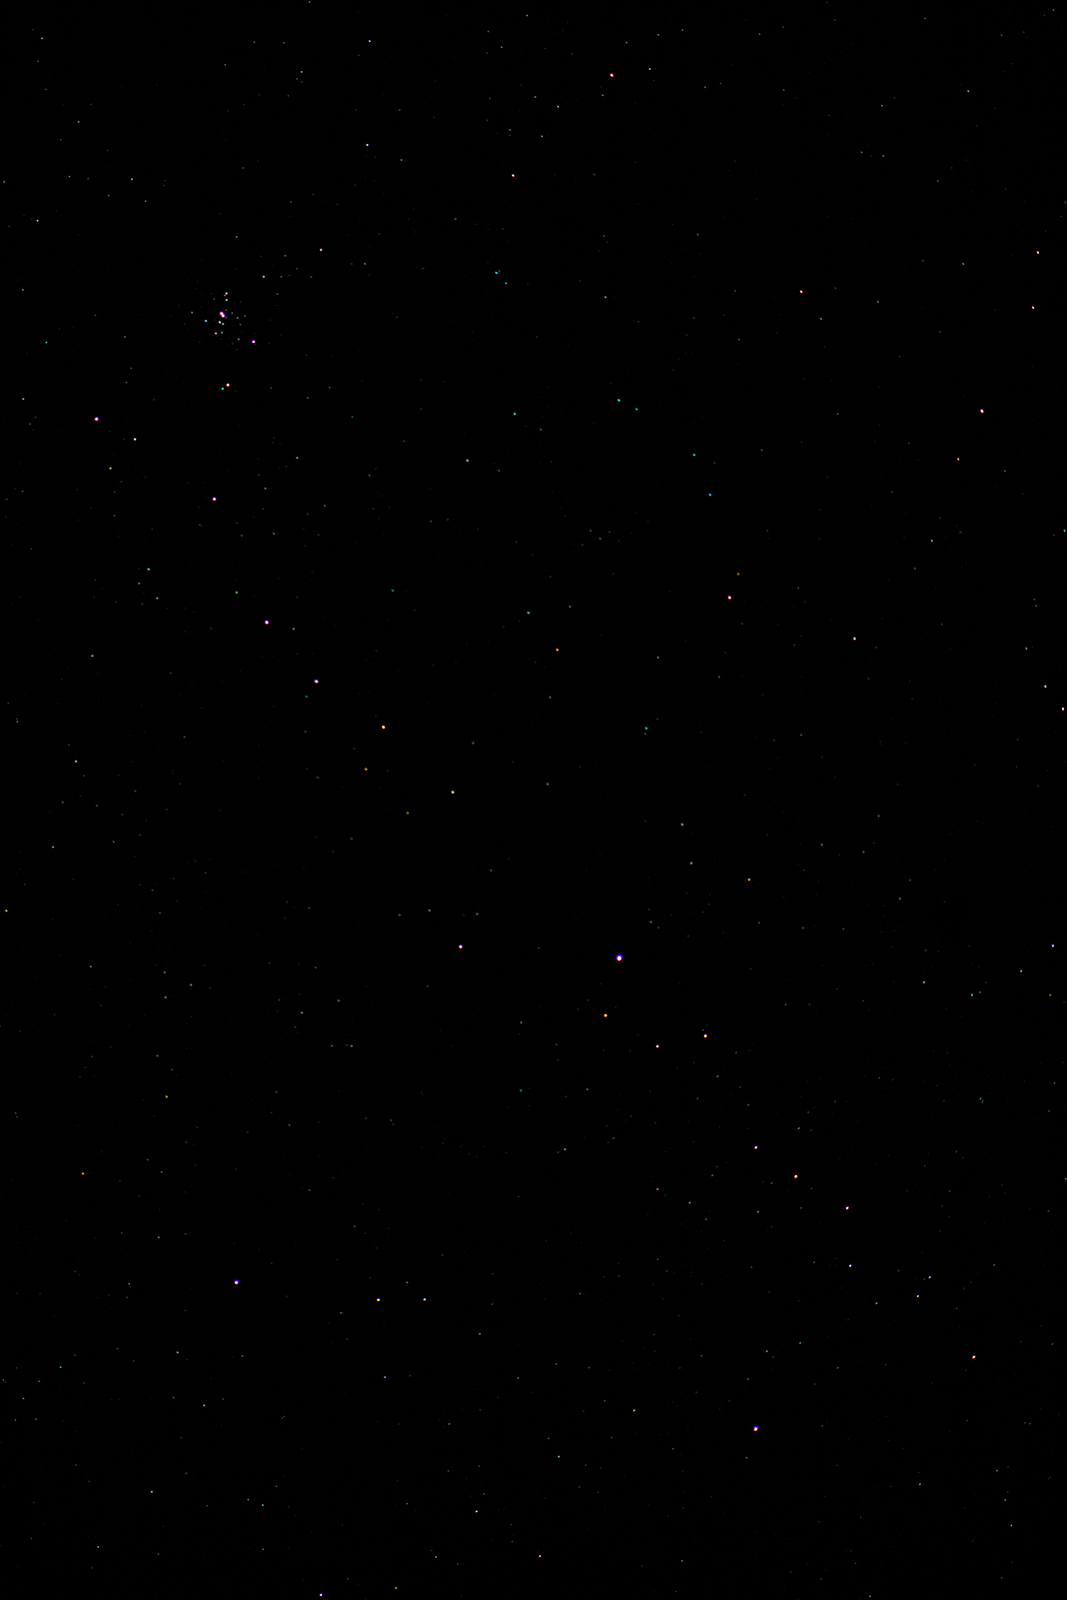 Kemble\'s Cascade & NGC 1502